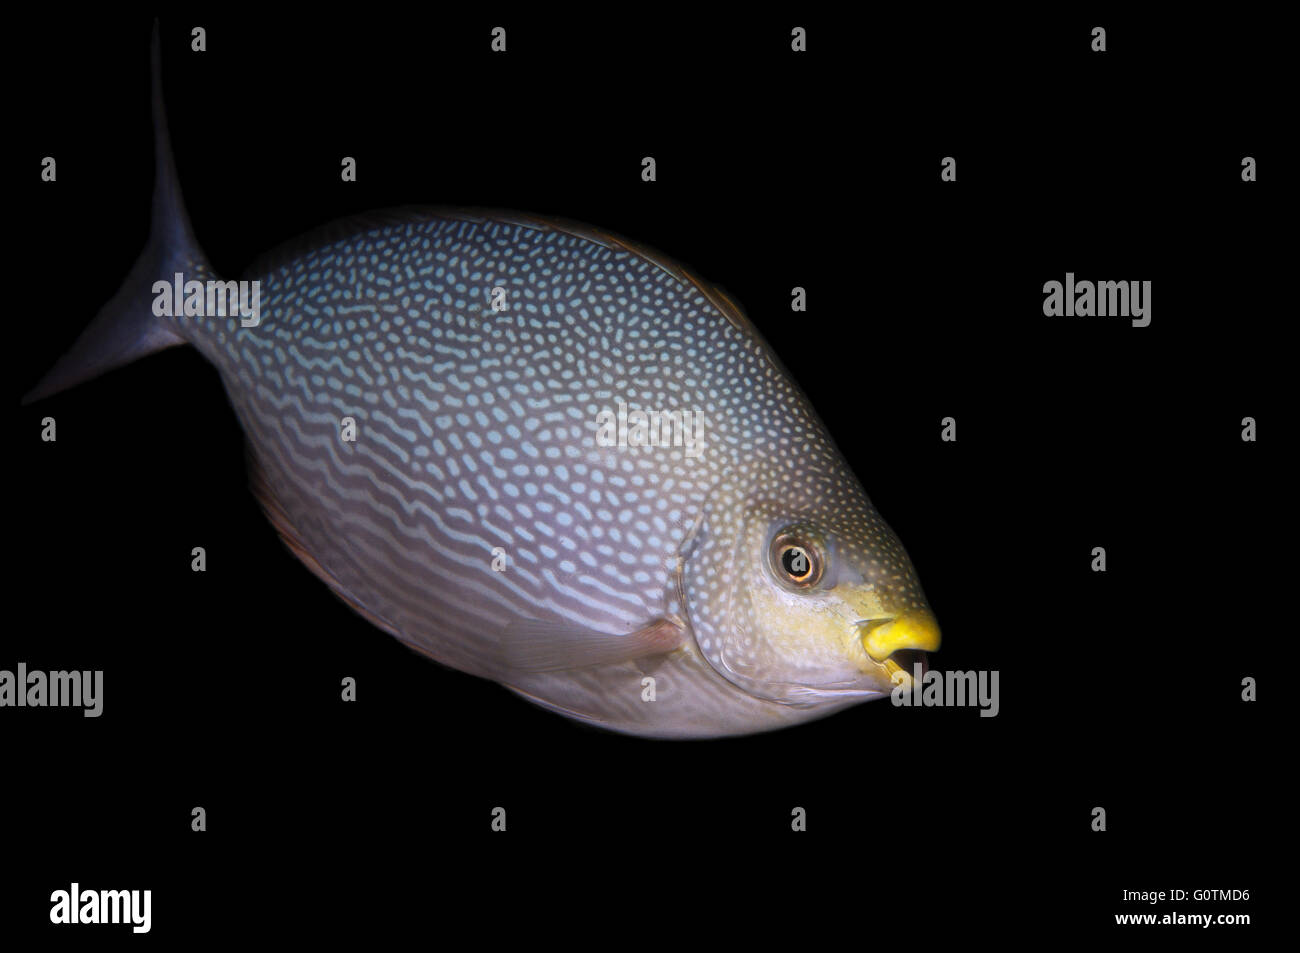 Streaked spinefoot, streaked spinefoot or Java rabbitfish